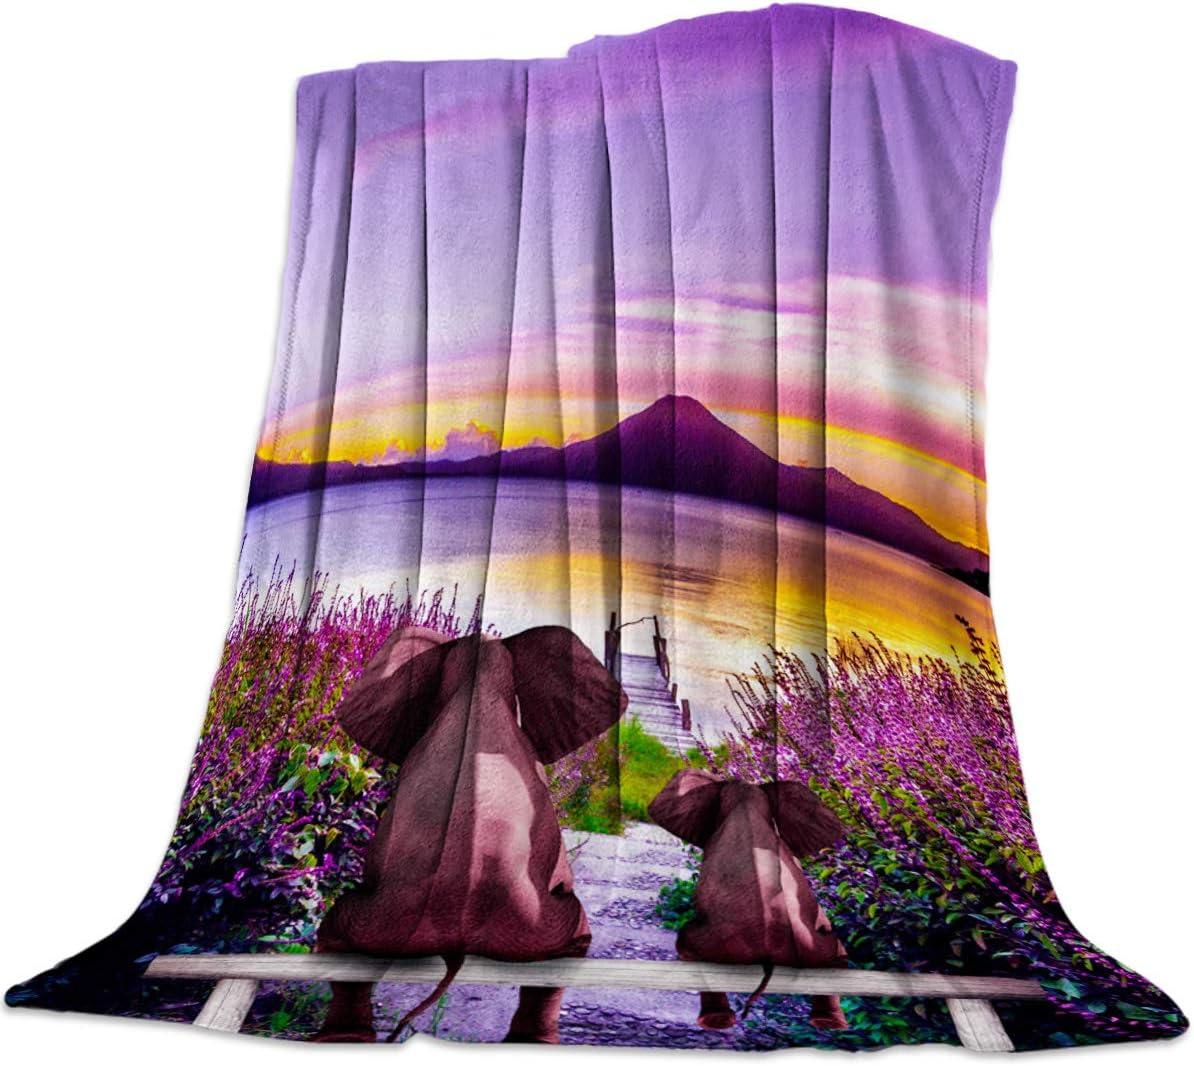 Xback Flannel Fleece Microfiber Special price Throw All for Blanket Li Season Bargain sale